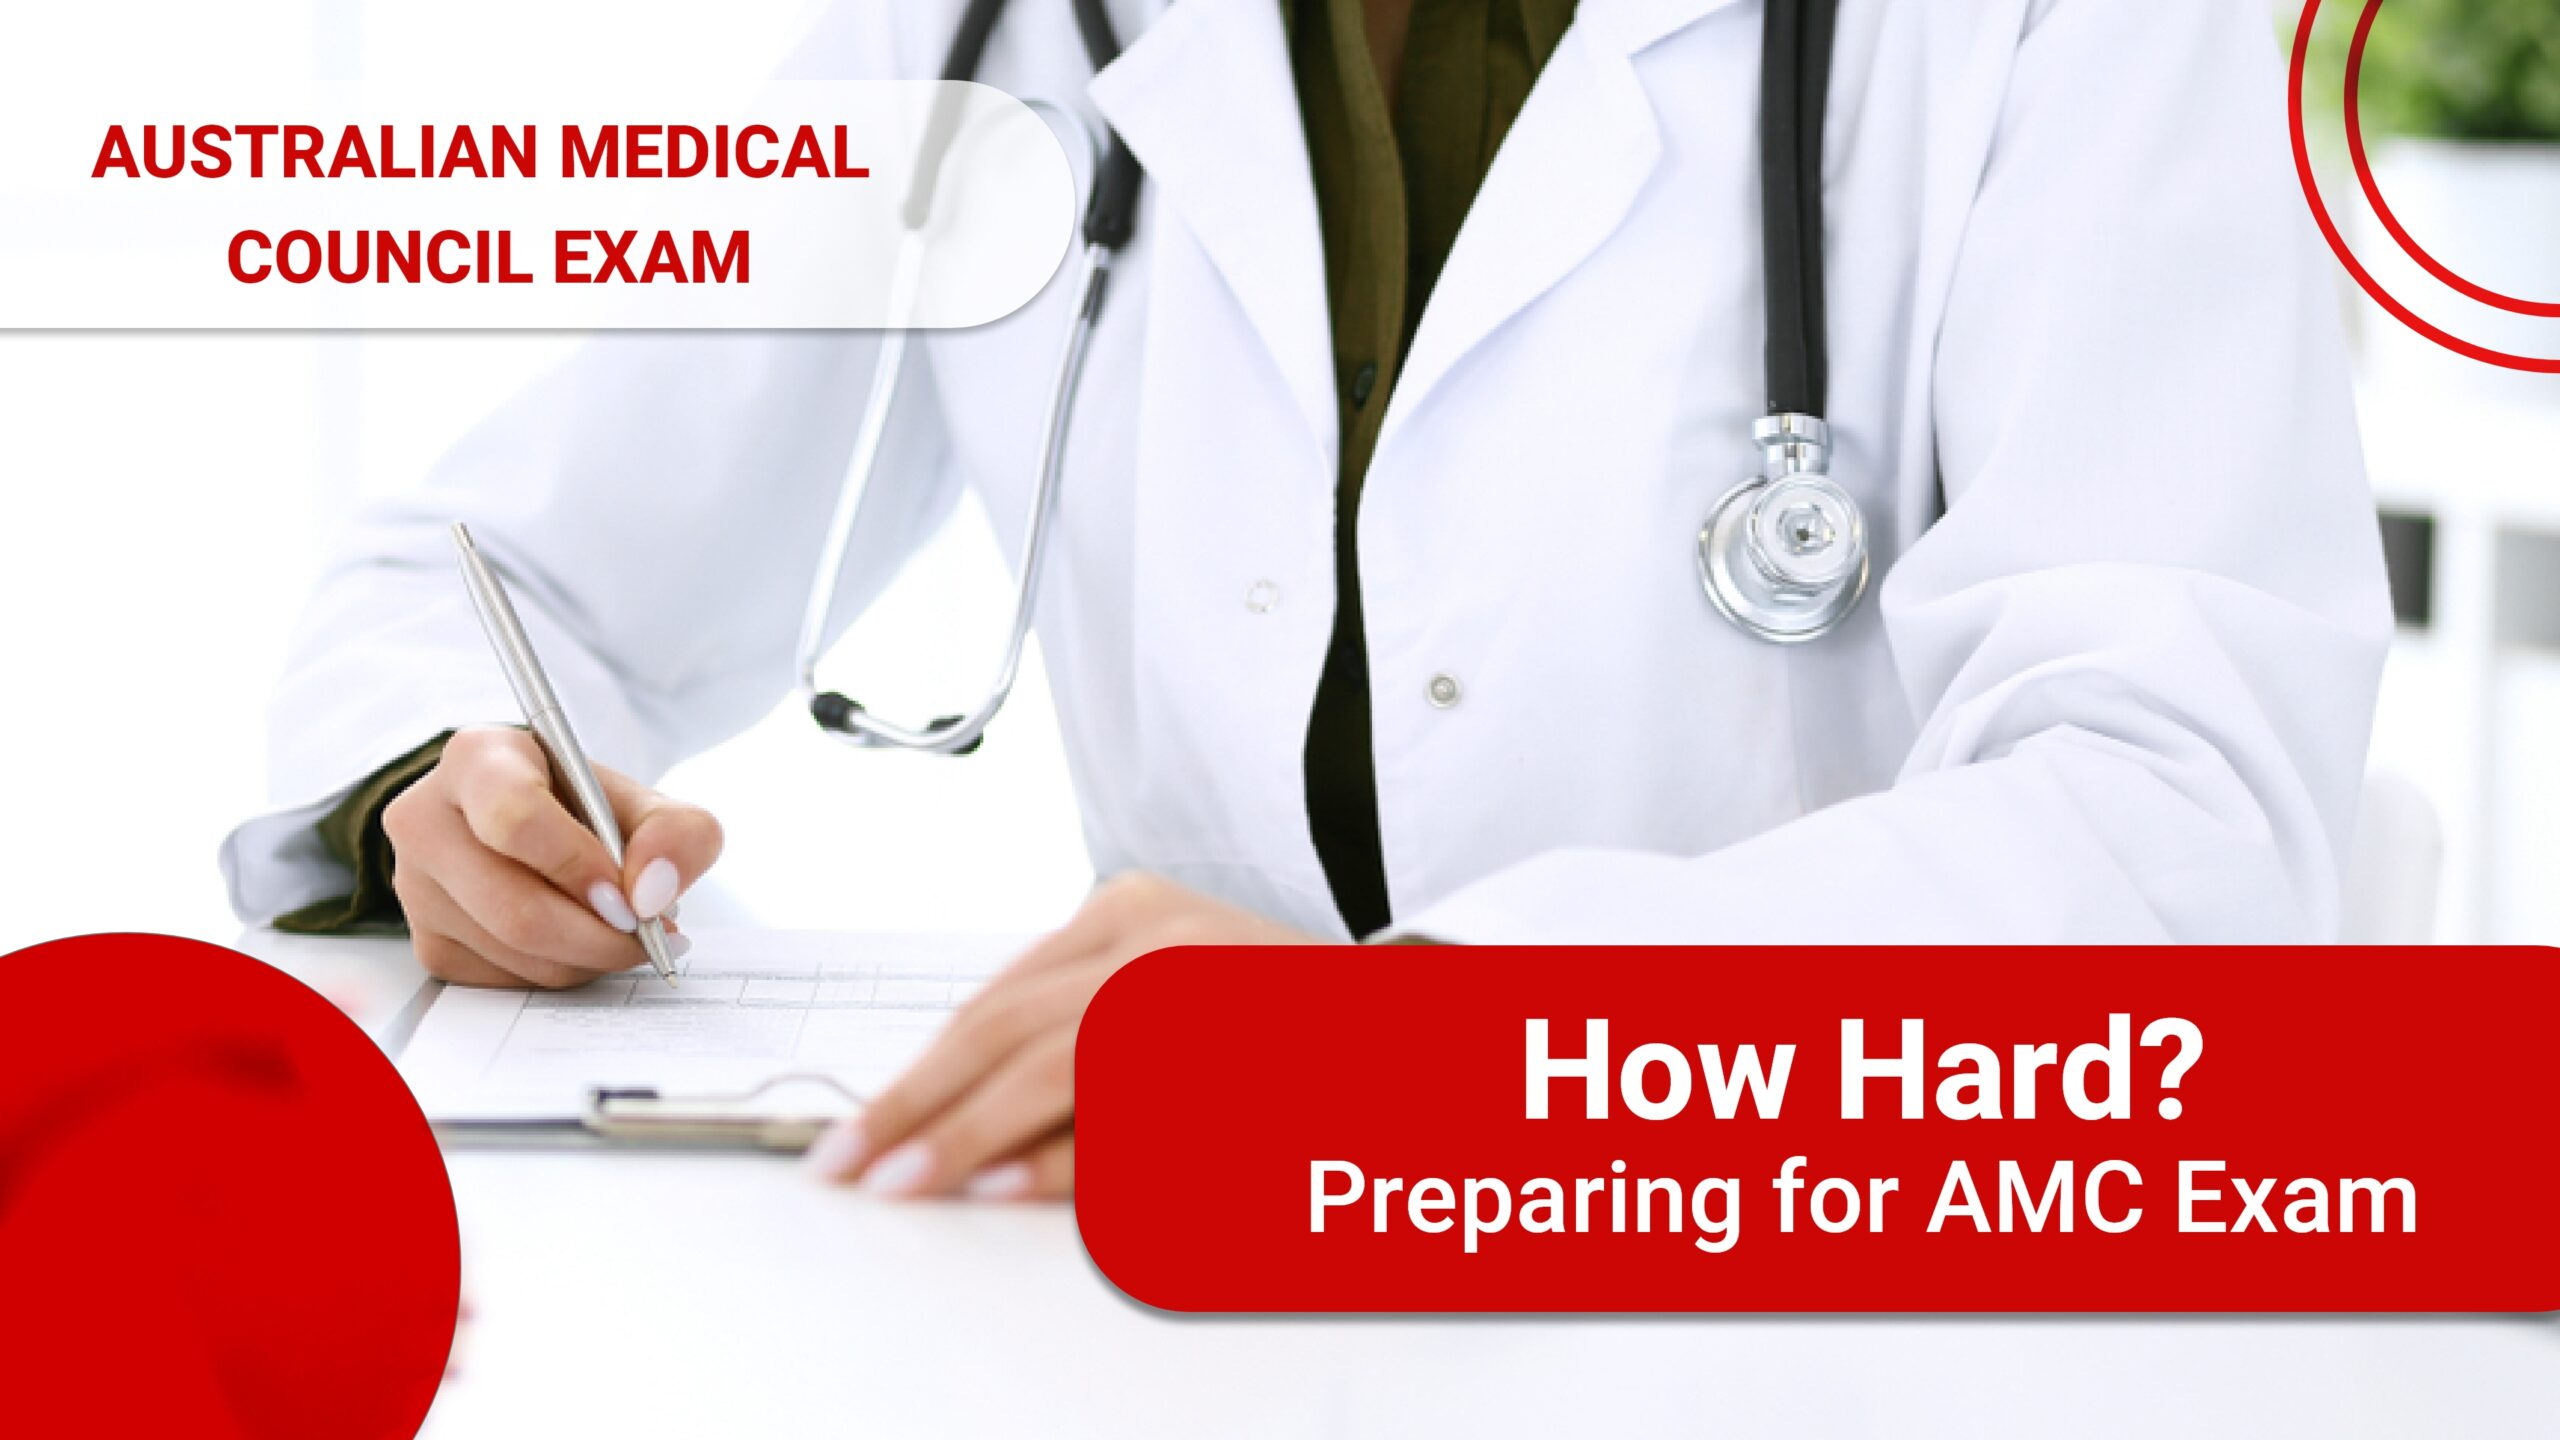 Australian Medical Council Exam: How Hard? Preparing for AMC Exam